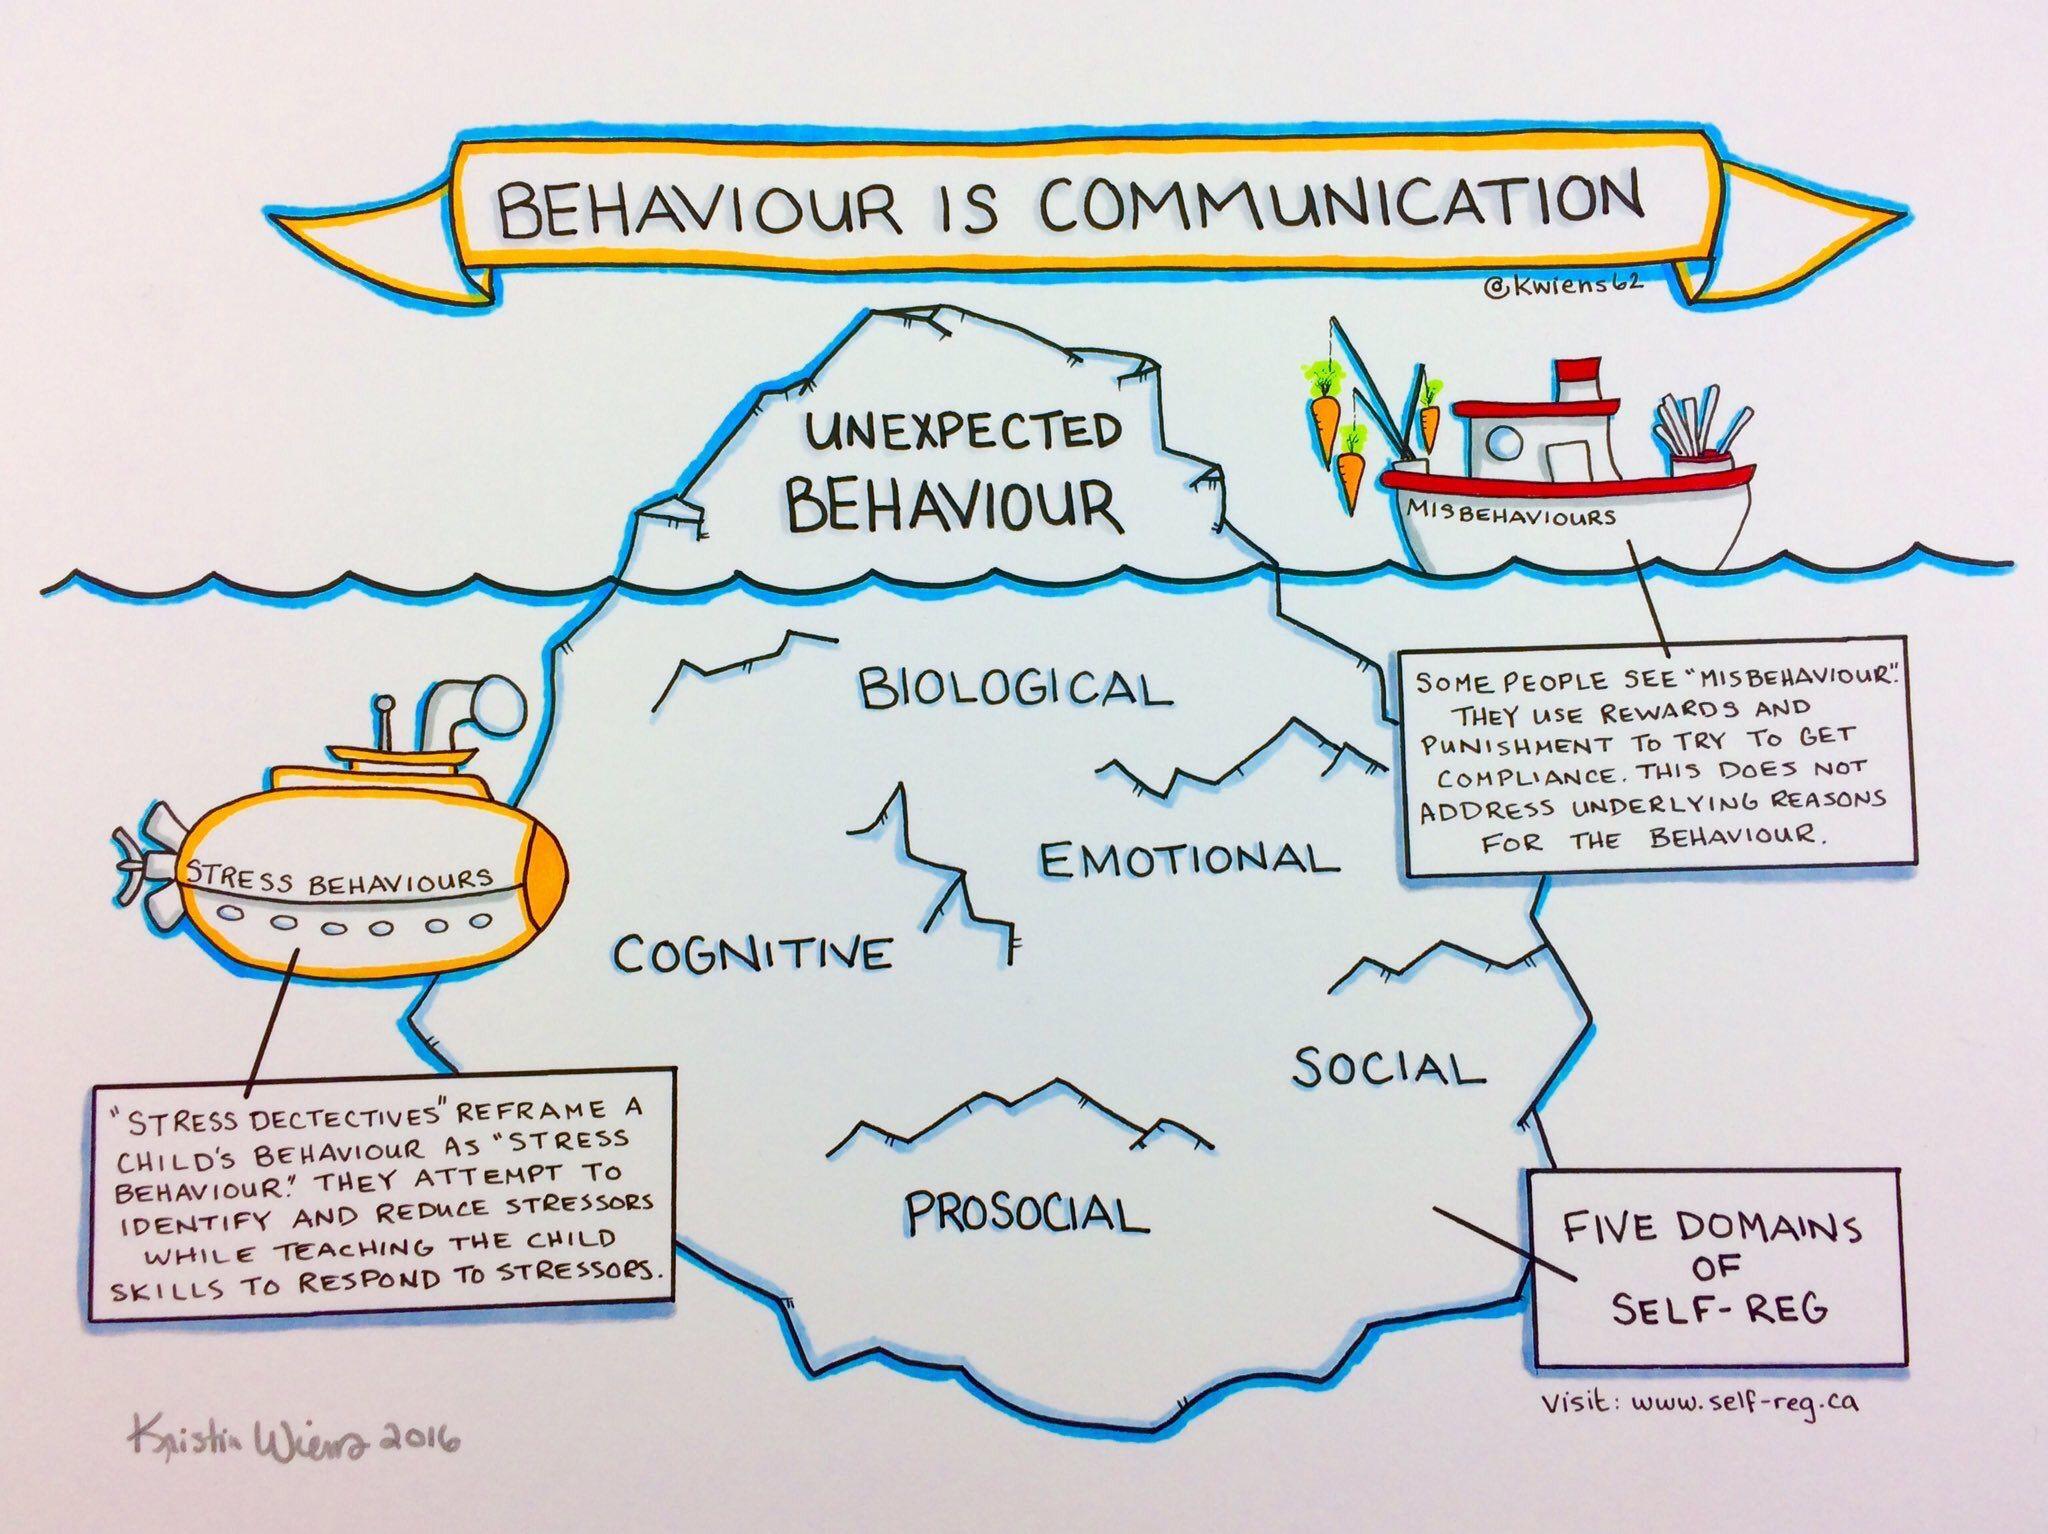 This All Behavior Is Communication Image Via Kristin